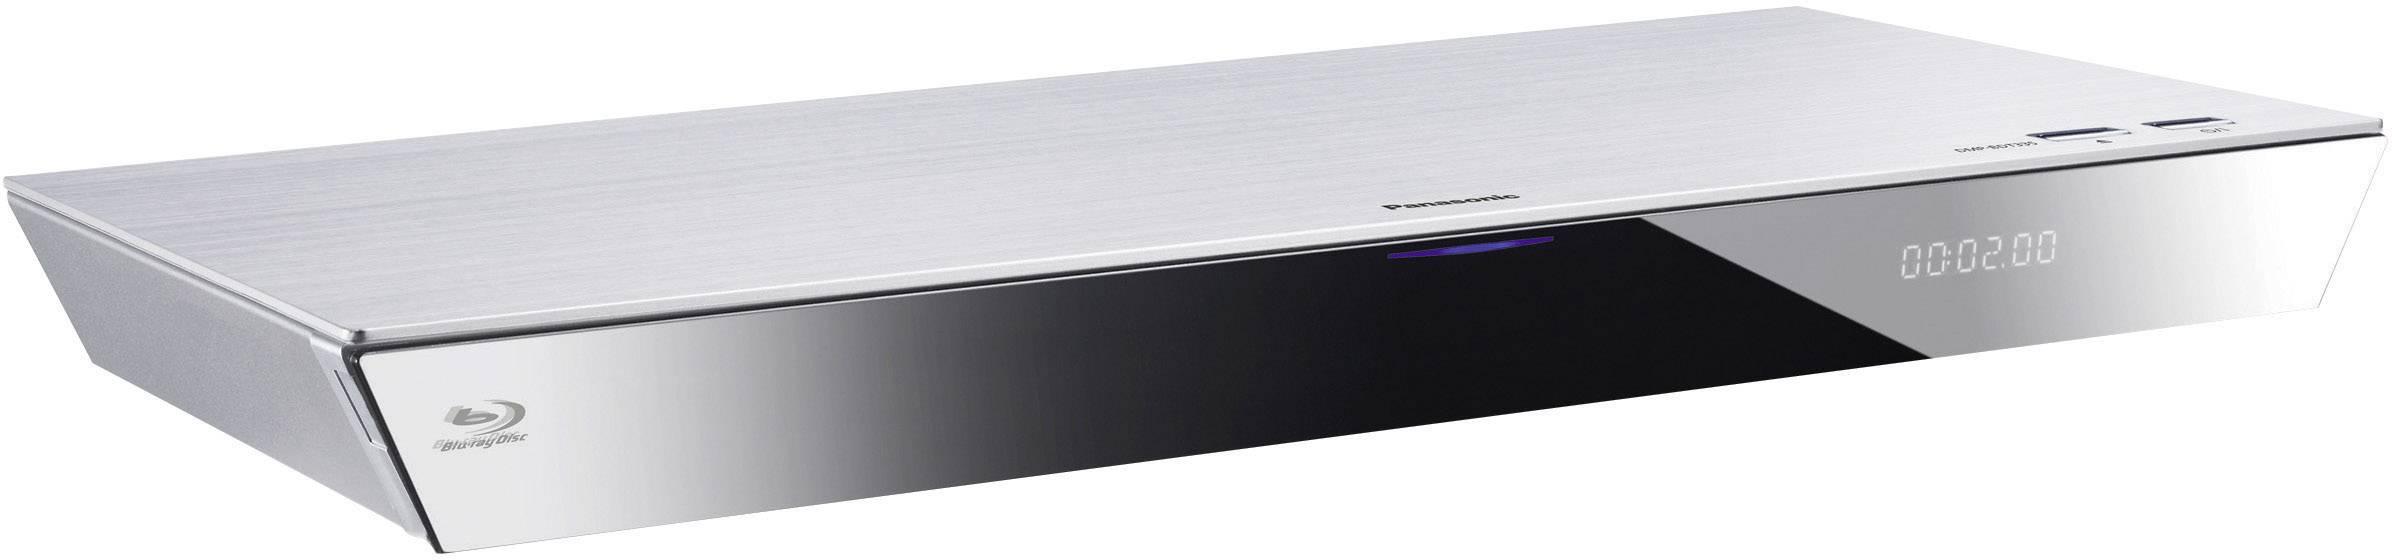 Panasonic DMP-BDT335EG Blu-ray Player Driver Windows 7